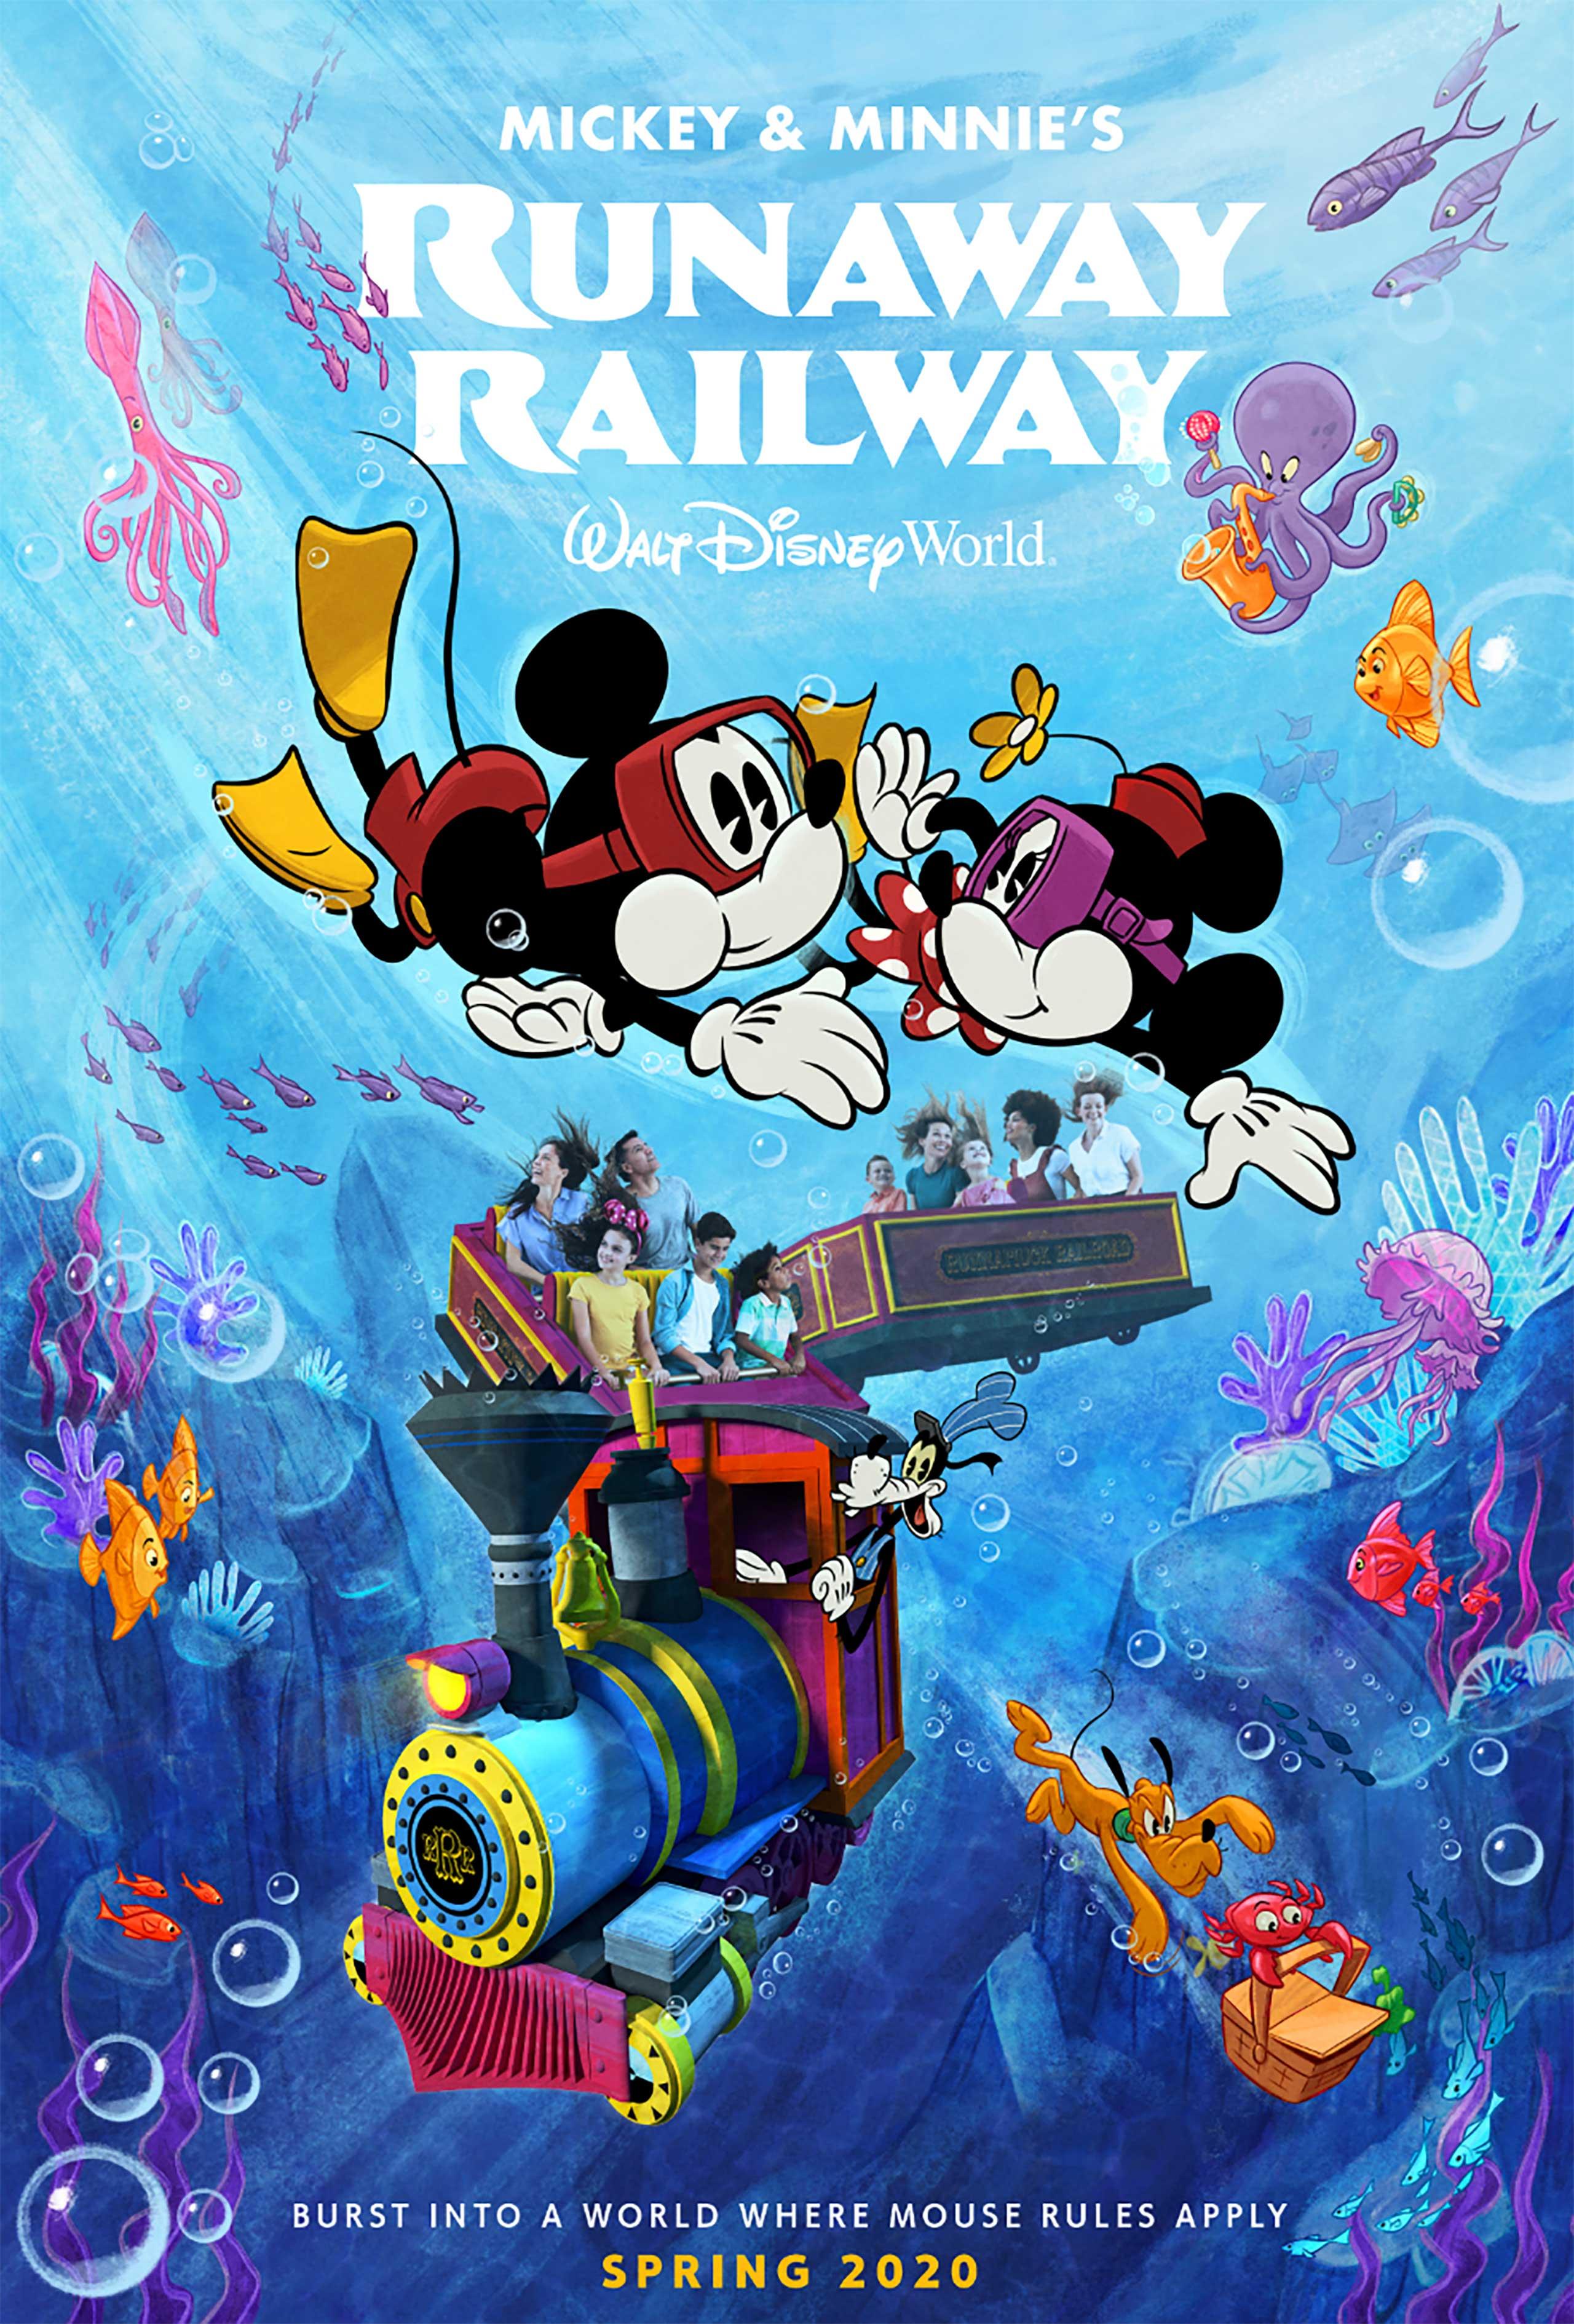 Mickey and Minnie's Runaway Railway poster November 2019